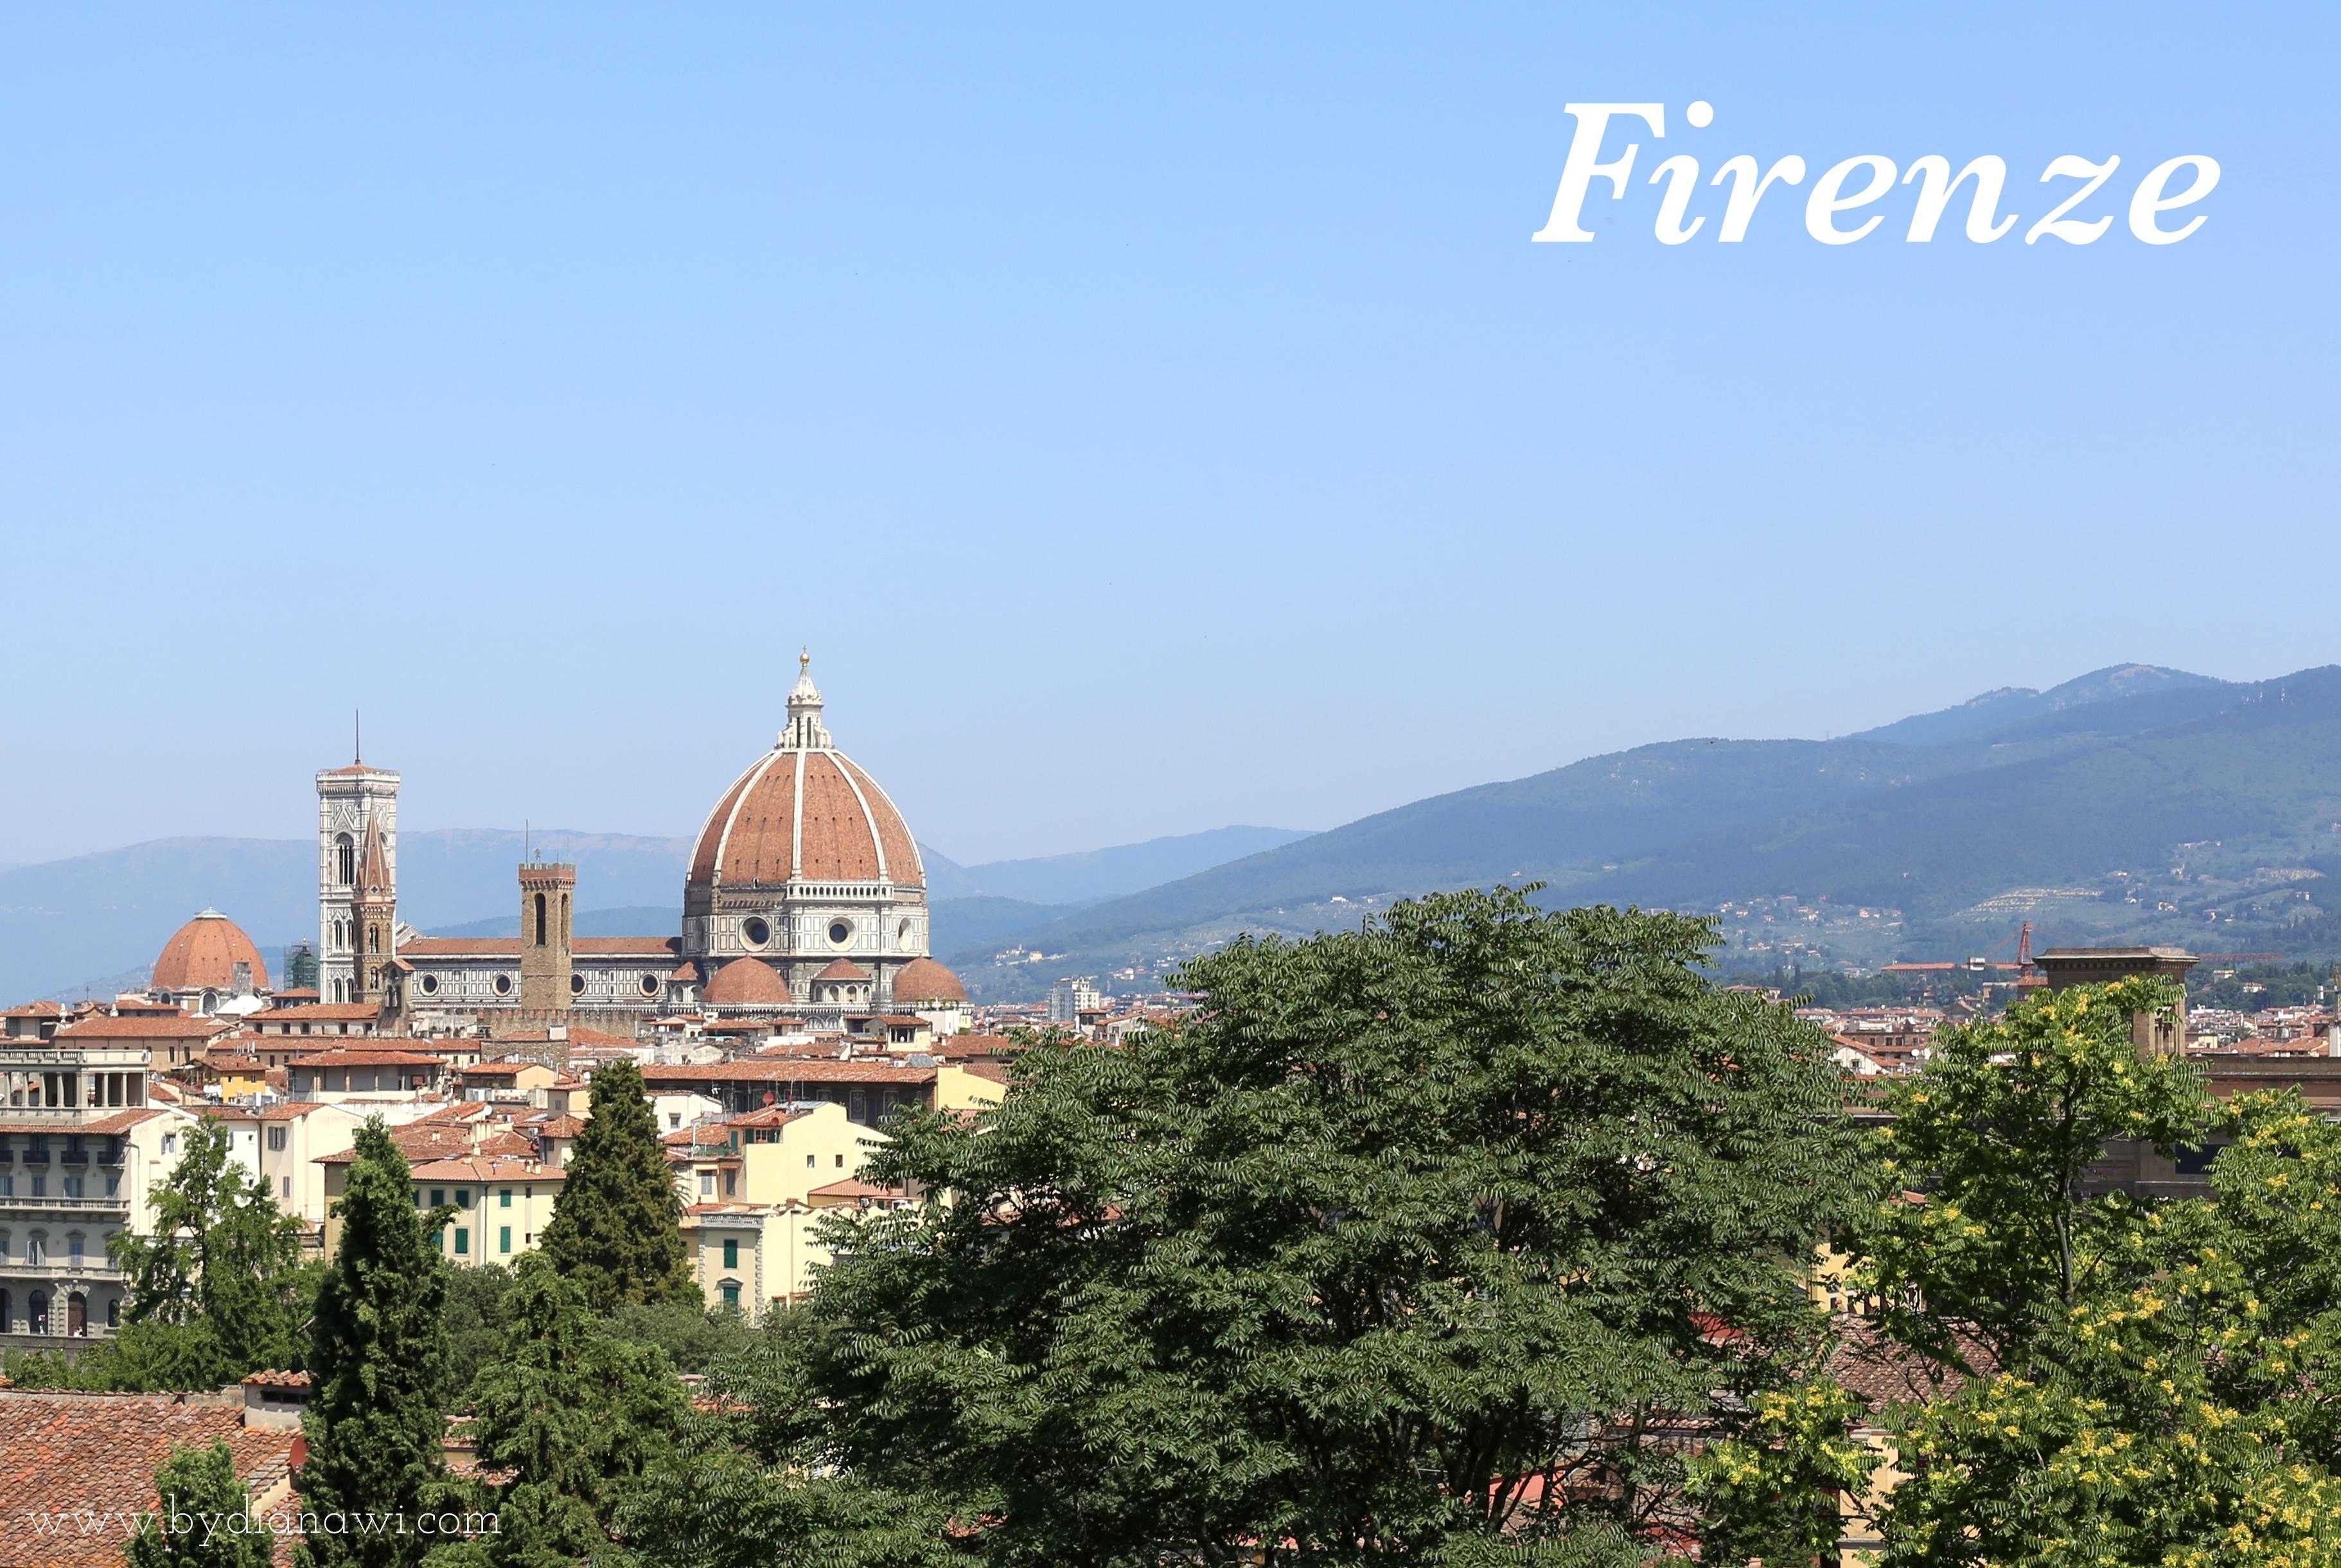 Toscana rejseguide, Firenze, italien guide